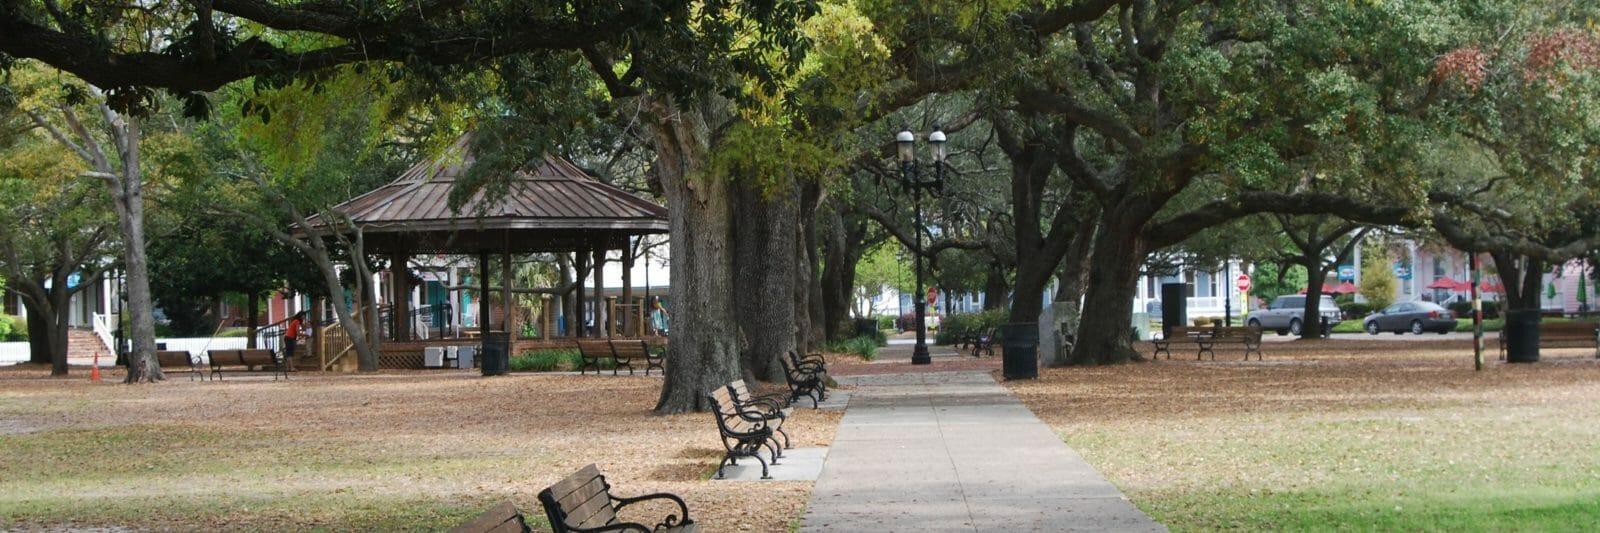 Pensacola City Park